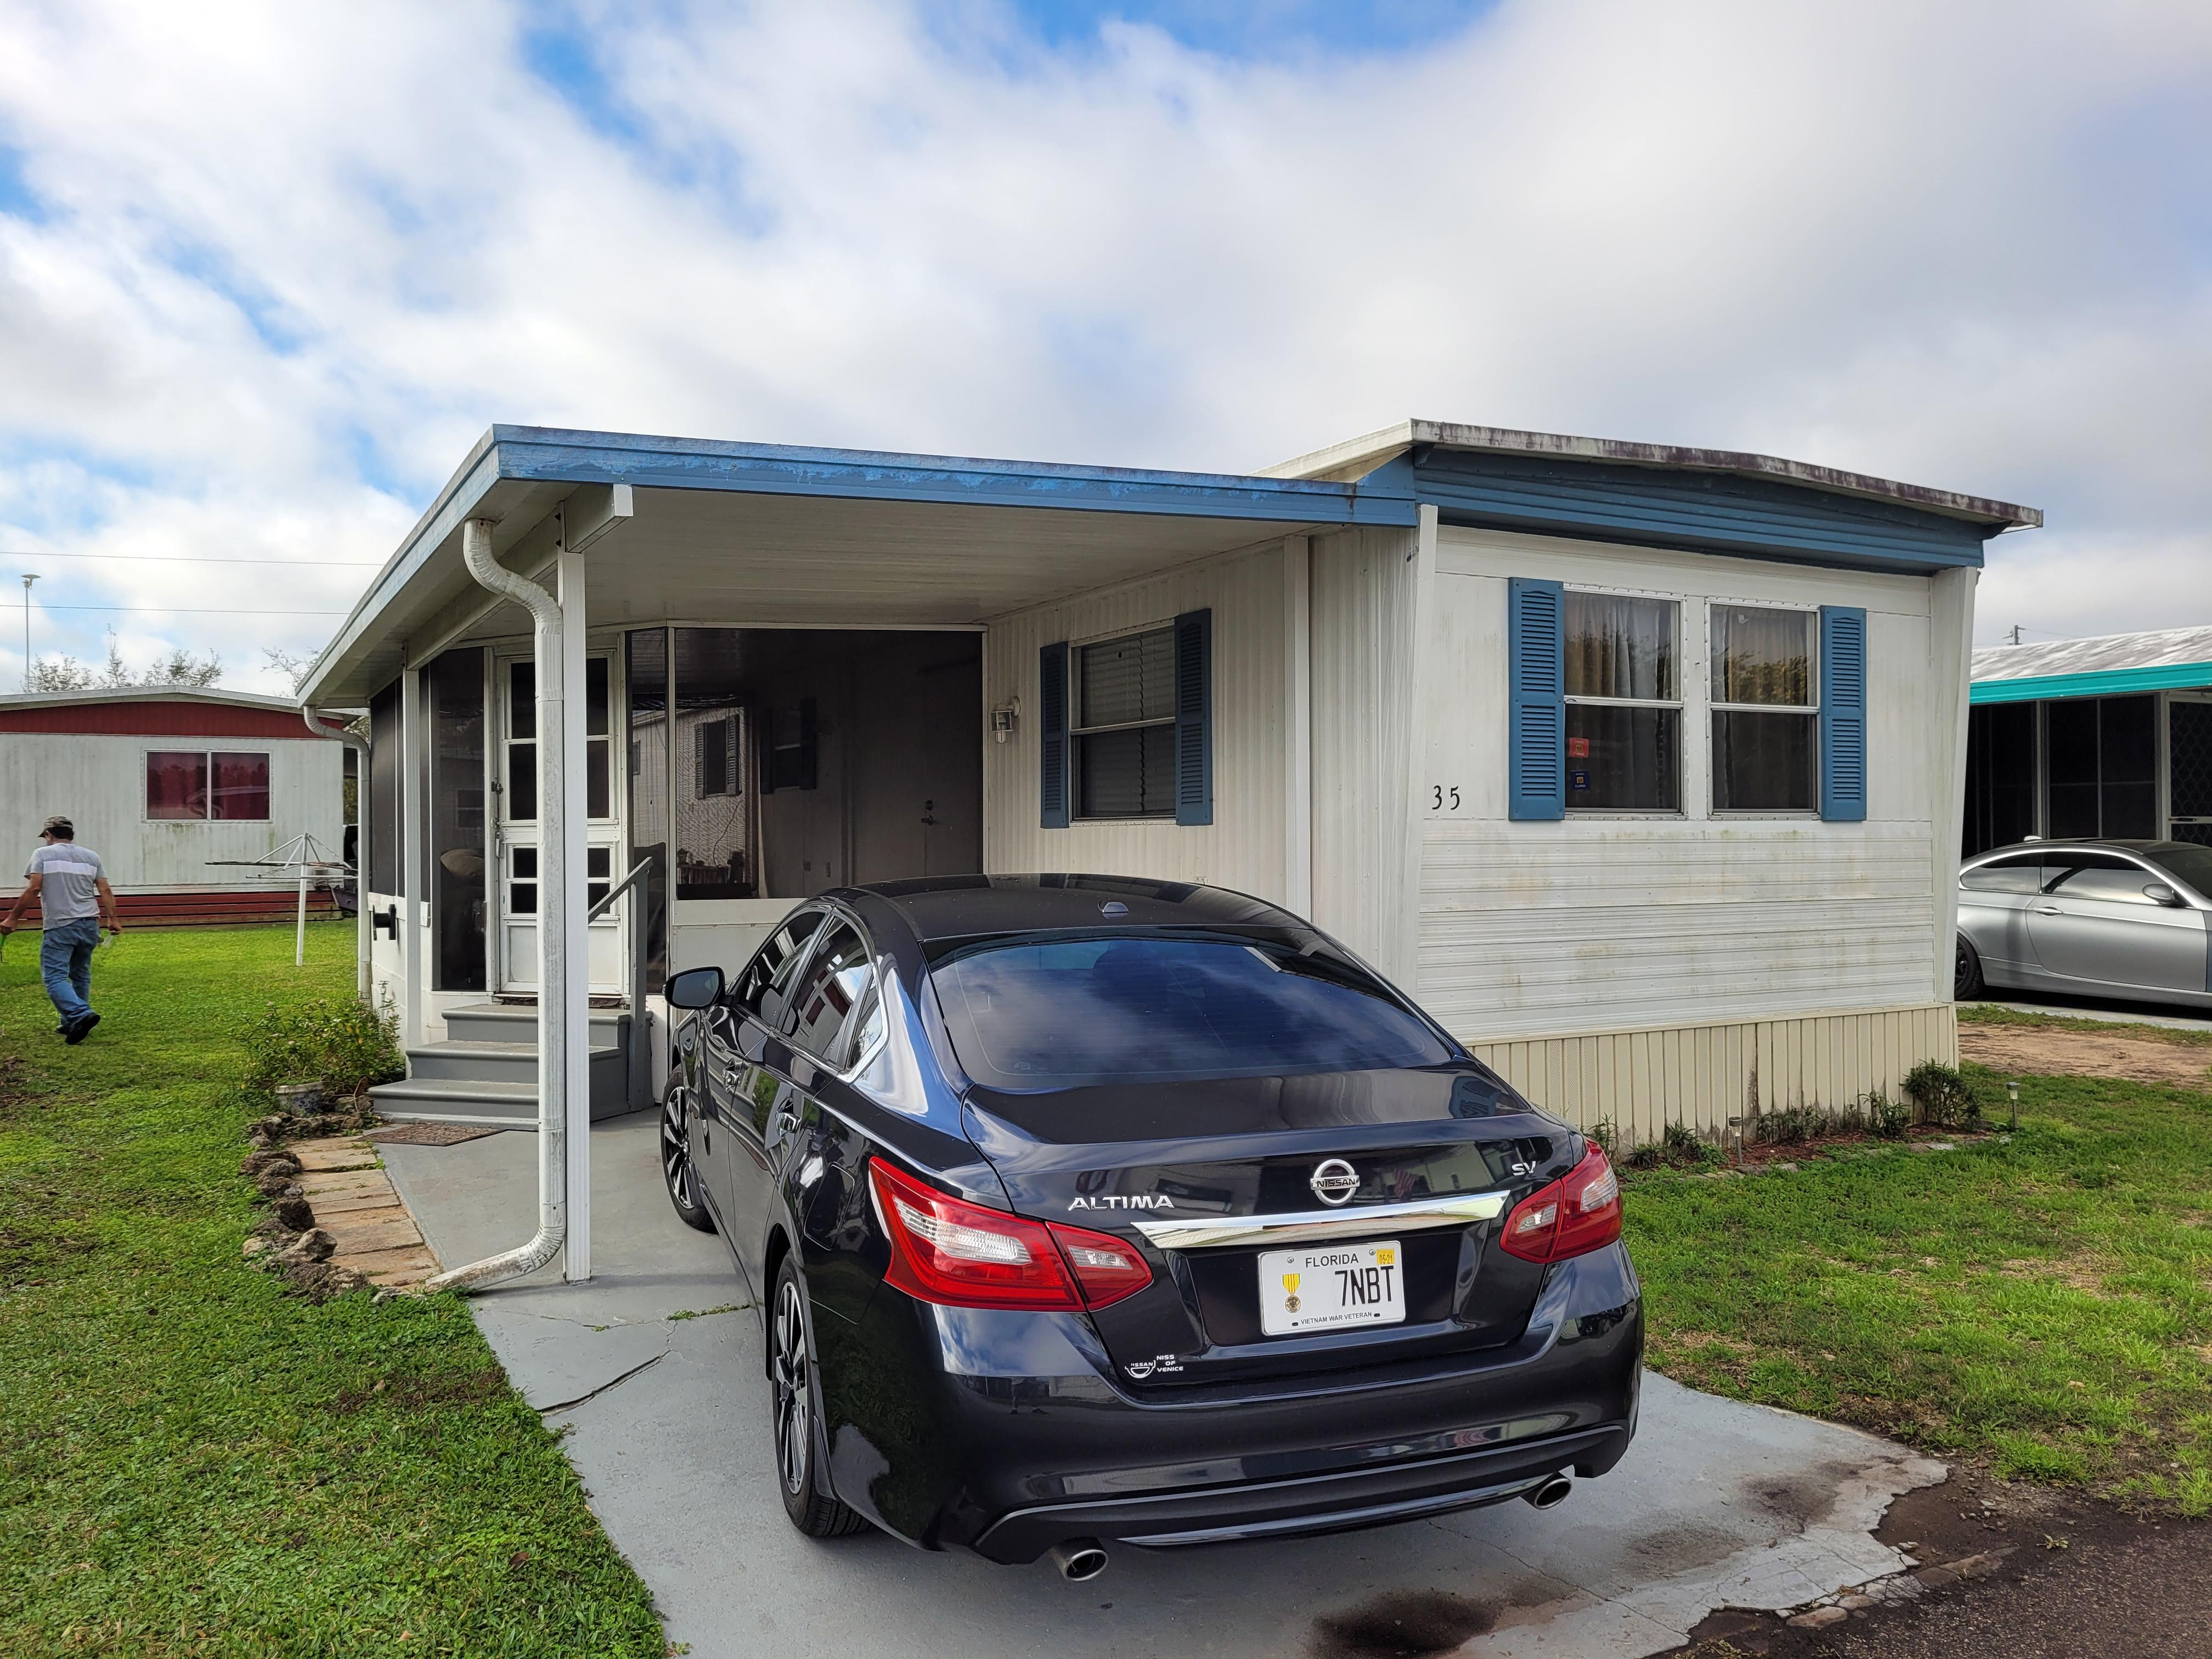 17730 US HIGHWAY 27, CLERMONT, Florida 34715, 2 Bedrooms Bedrooms, ,1 BathroomBathrooms,Residential,For Sale,17730 US HIGHWAY 27,10976296